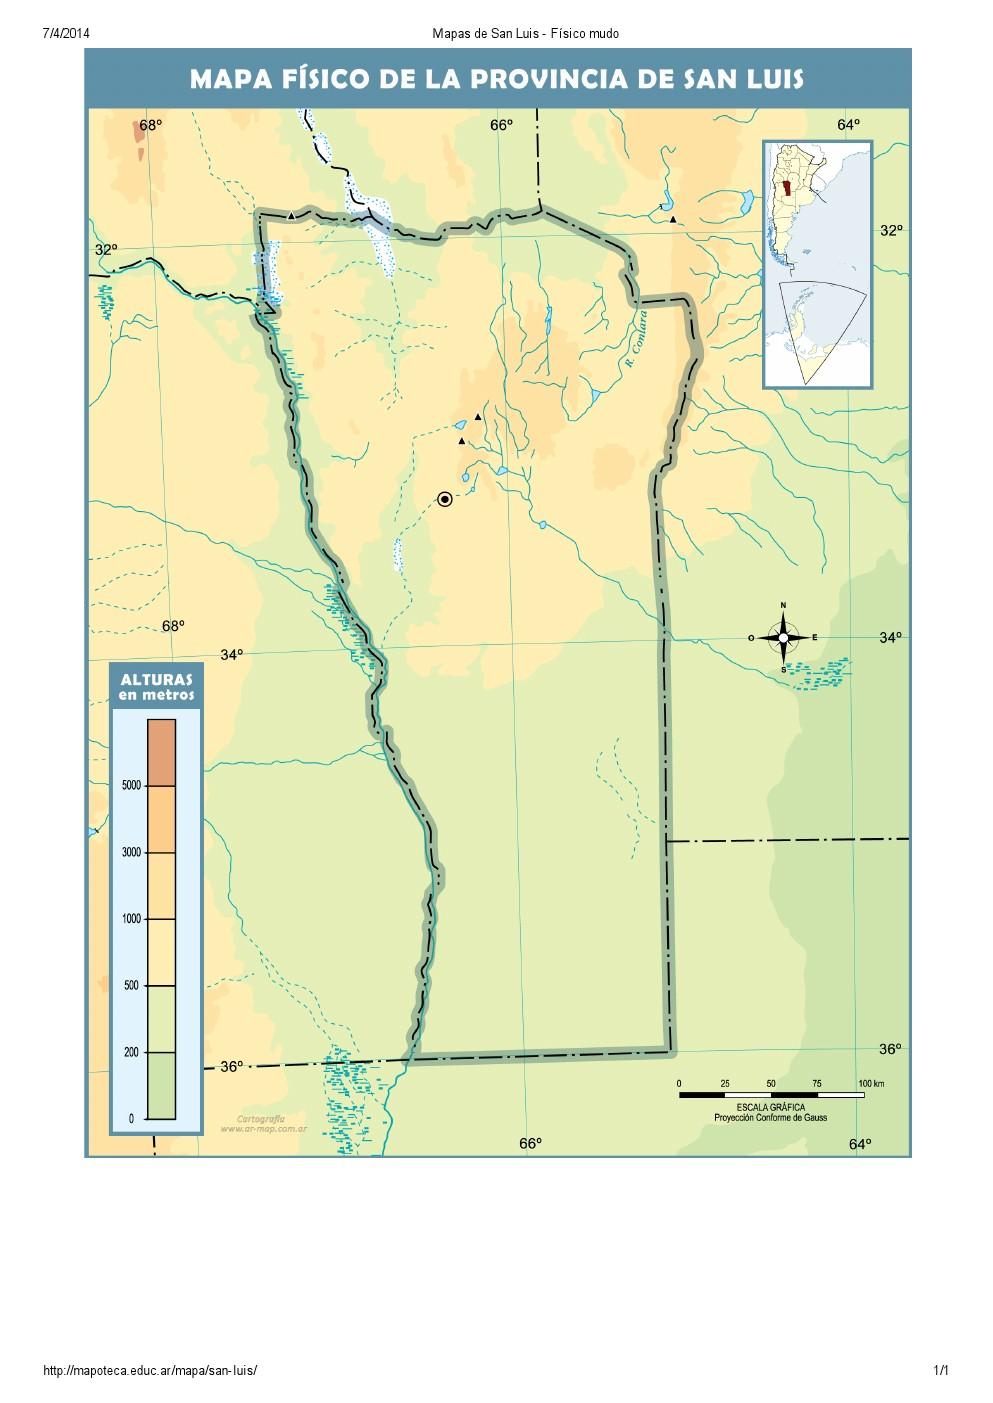 Mapa mudo de ríos de San Luis. Mapoteca de Educ.ar